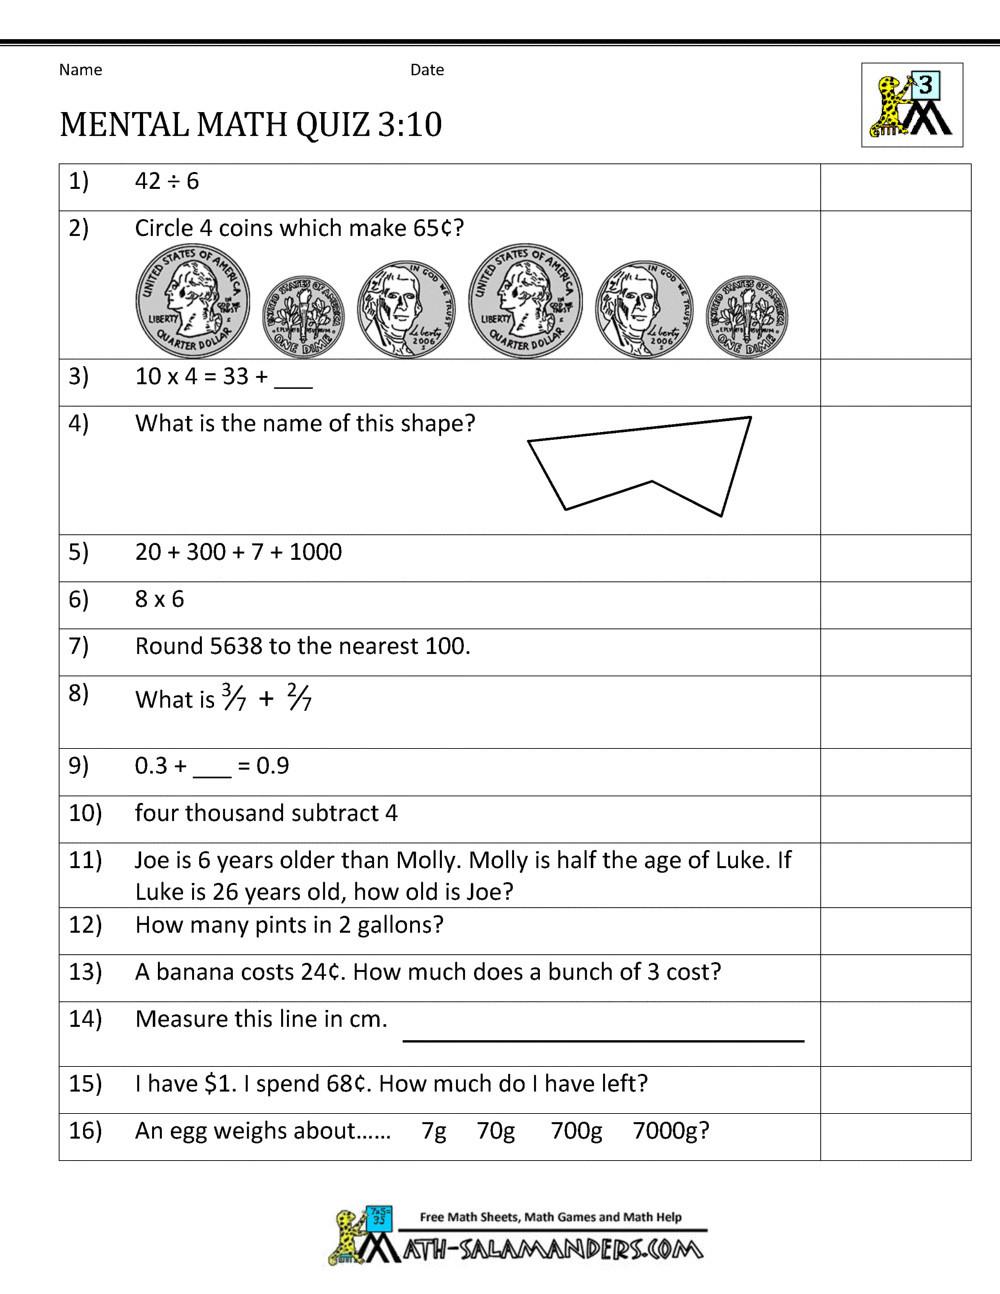 Mass Worksheets 3rd Grade 4 Free Math Worksheets Third Grade 3 Word Problems Mixed